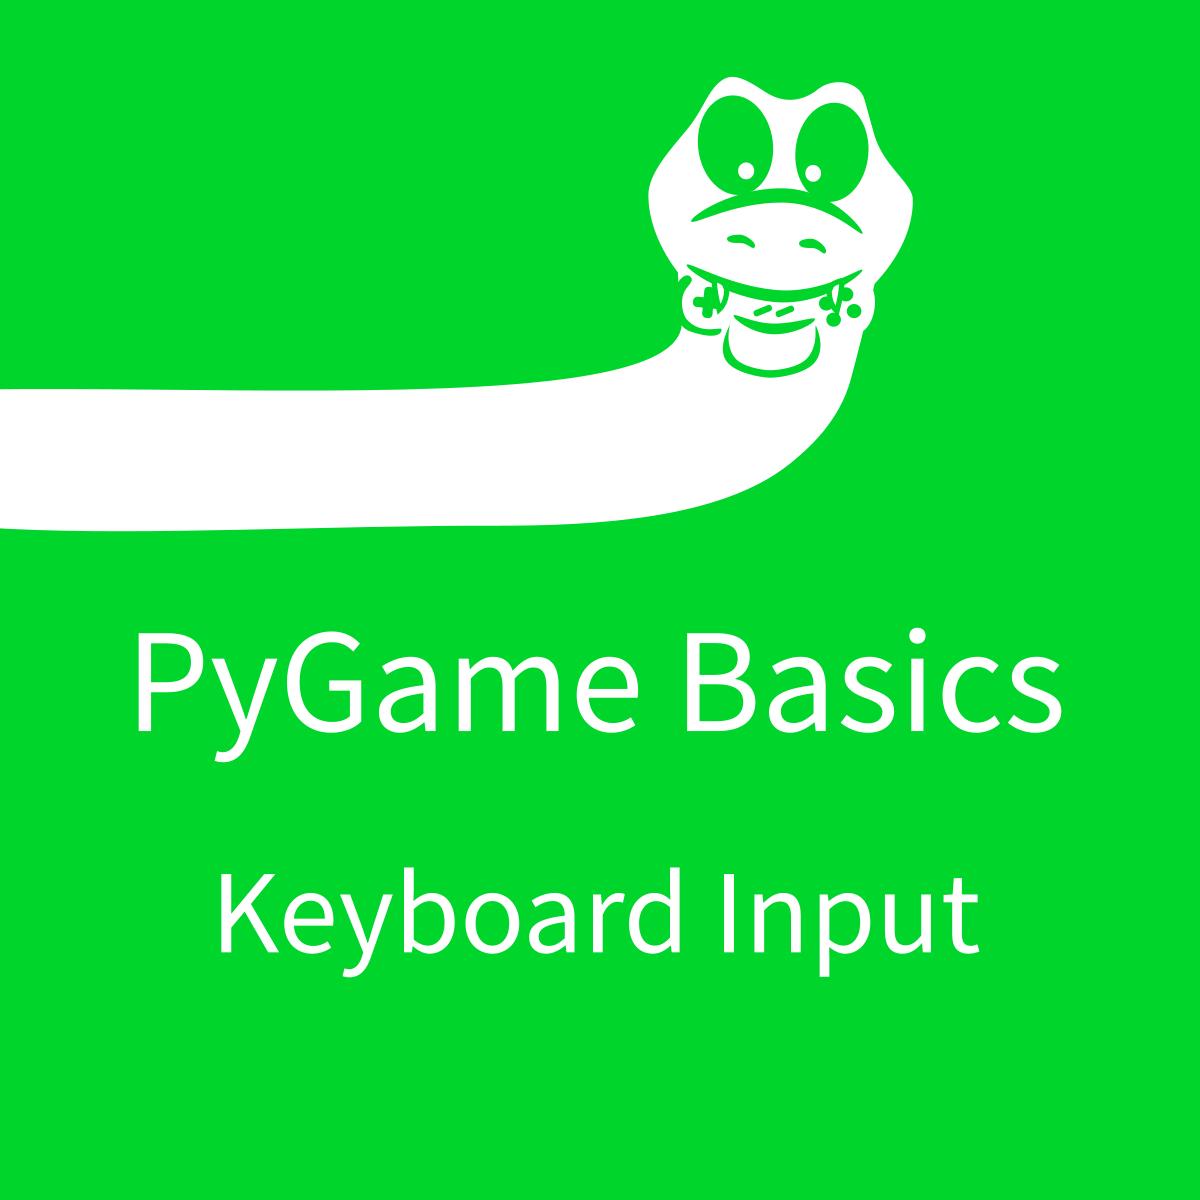 PyGame Basics: Keyboard Input